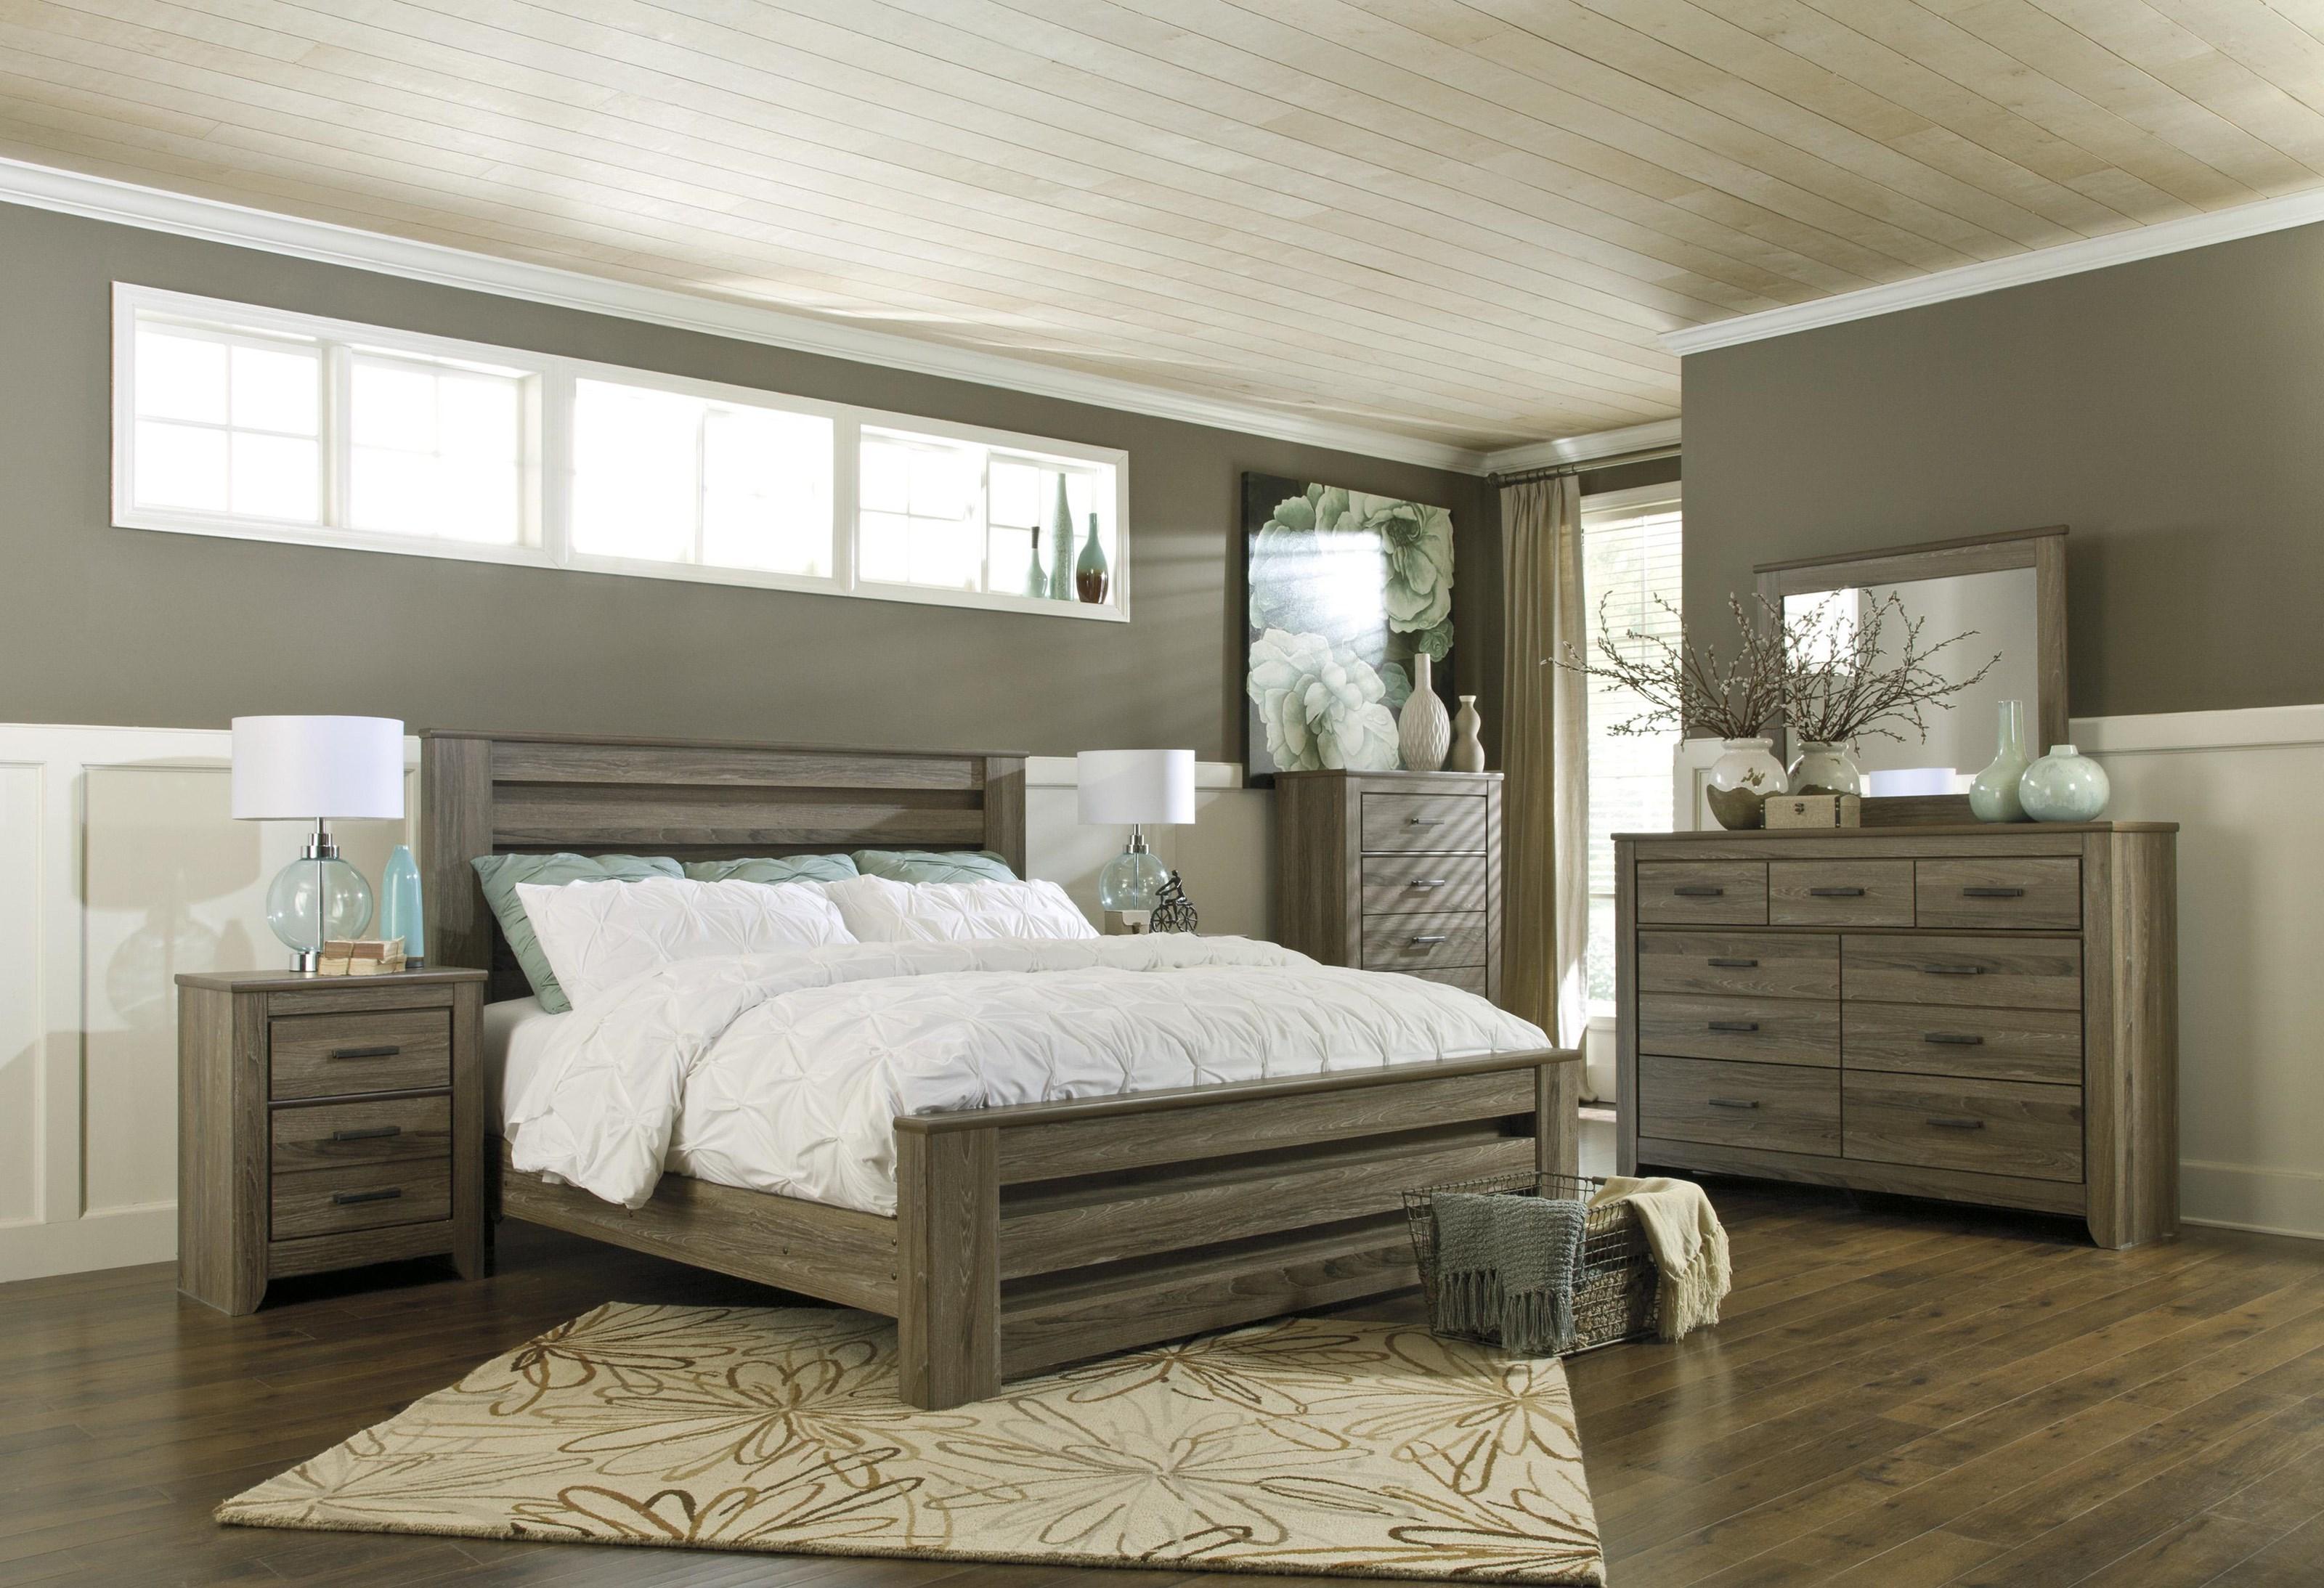 Adalyn 4 Piece Queen Bedroom at Ruby Gordon Home